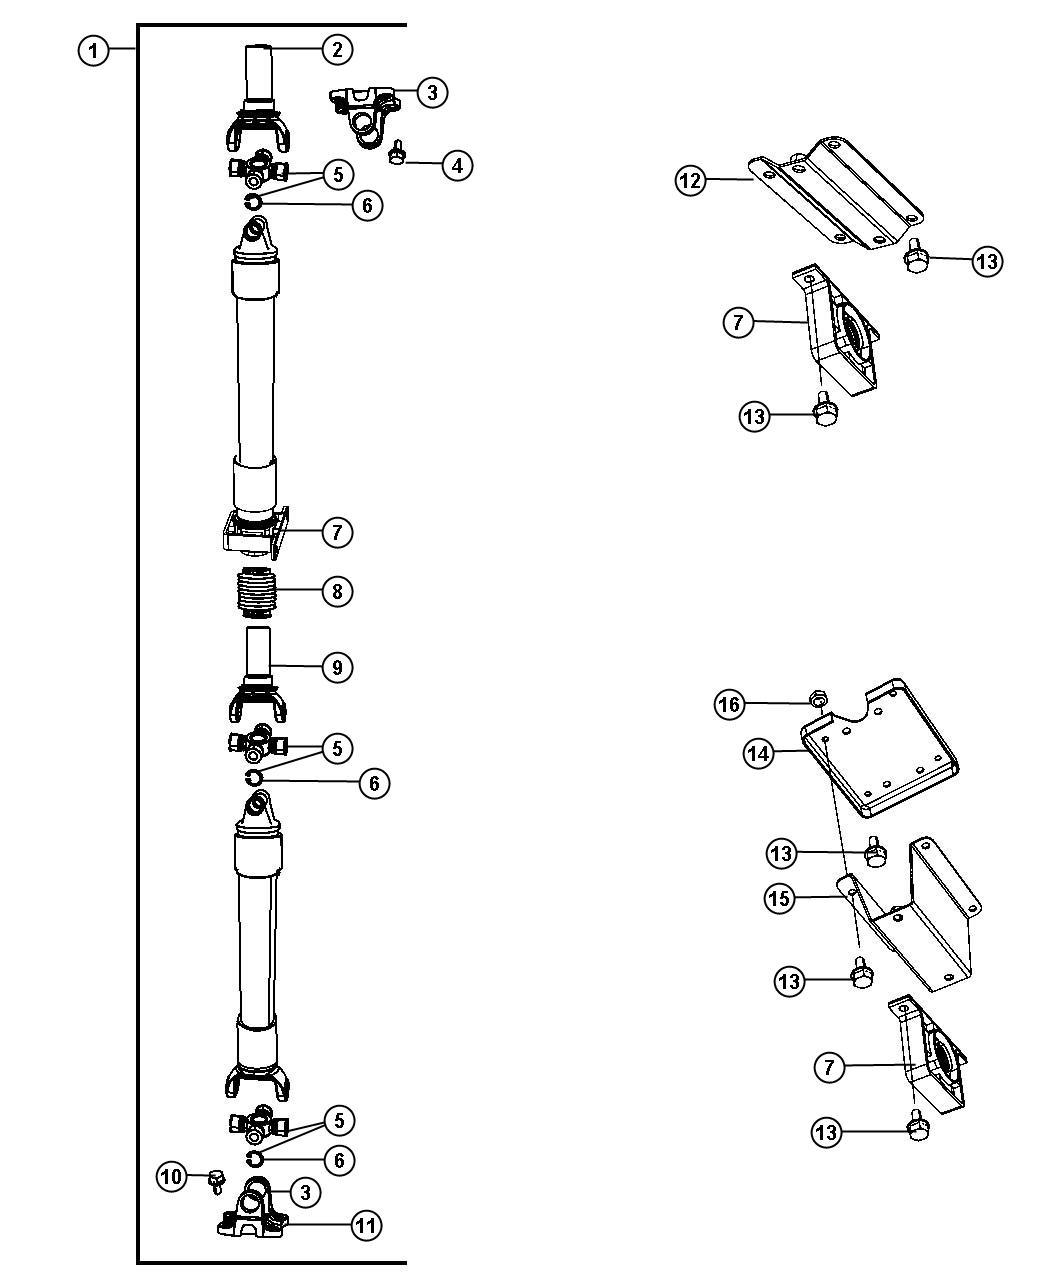 Ram 3500 Shaft. Drive. Rear 2-piece. [6-speed manual g56